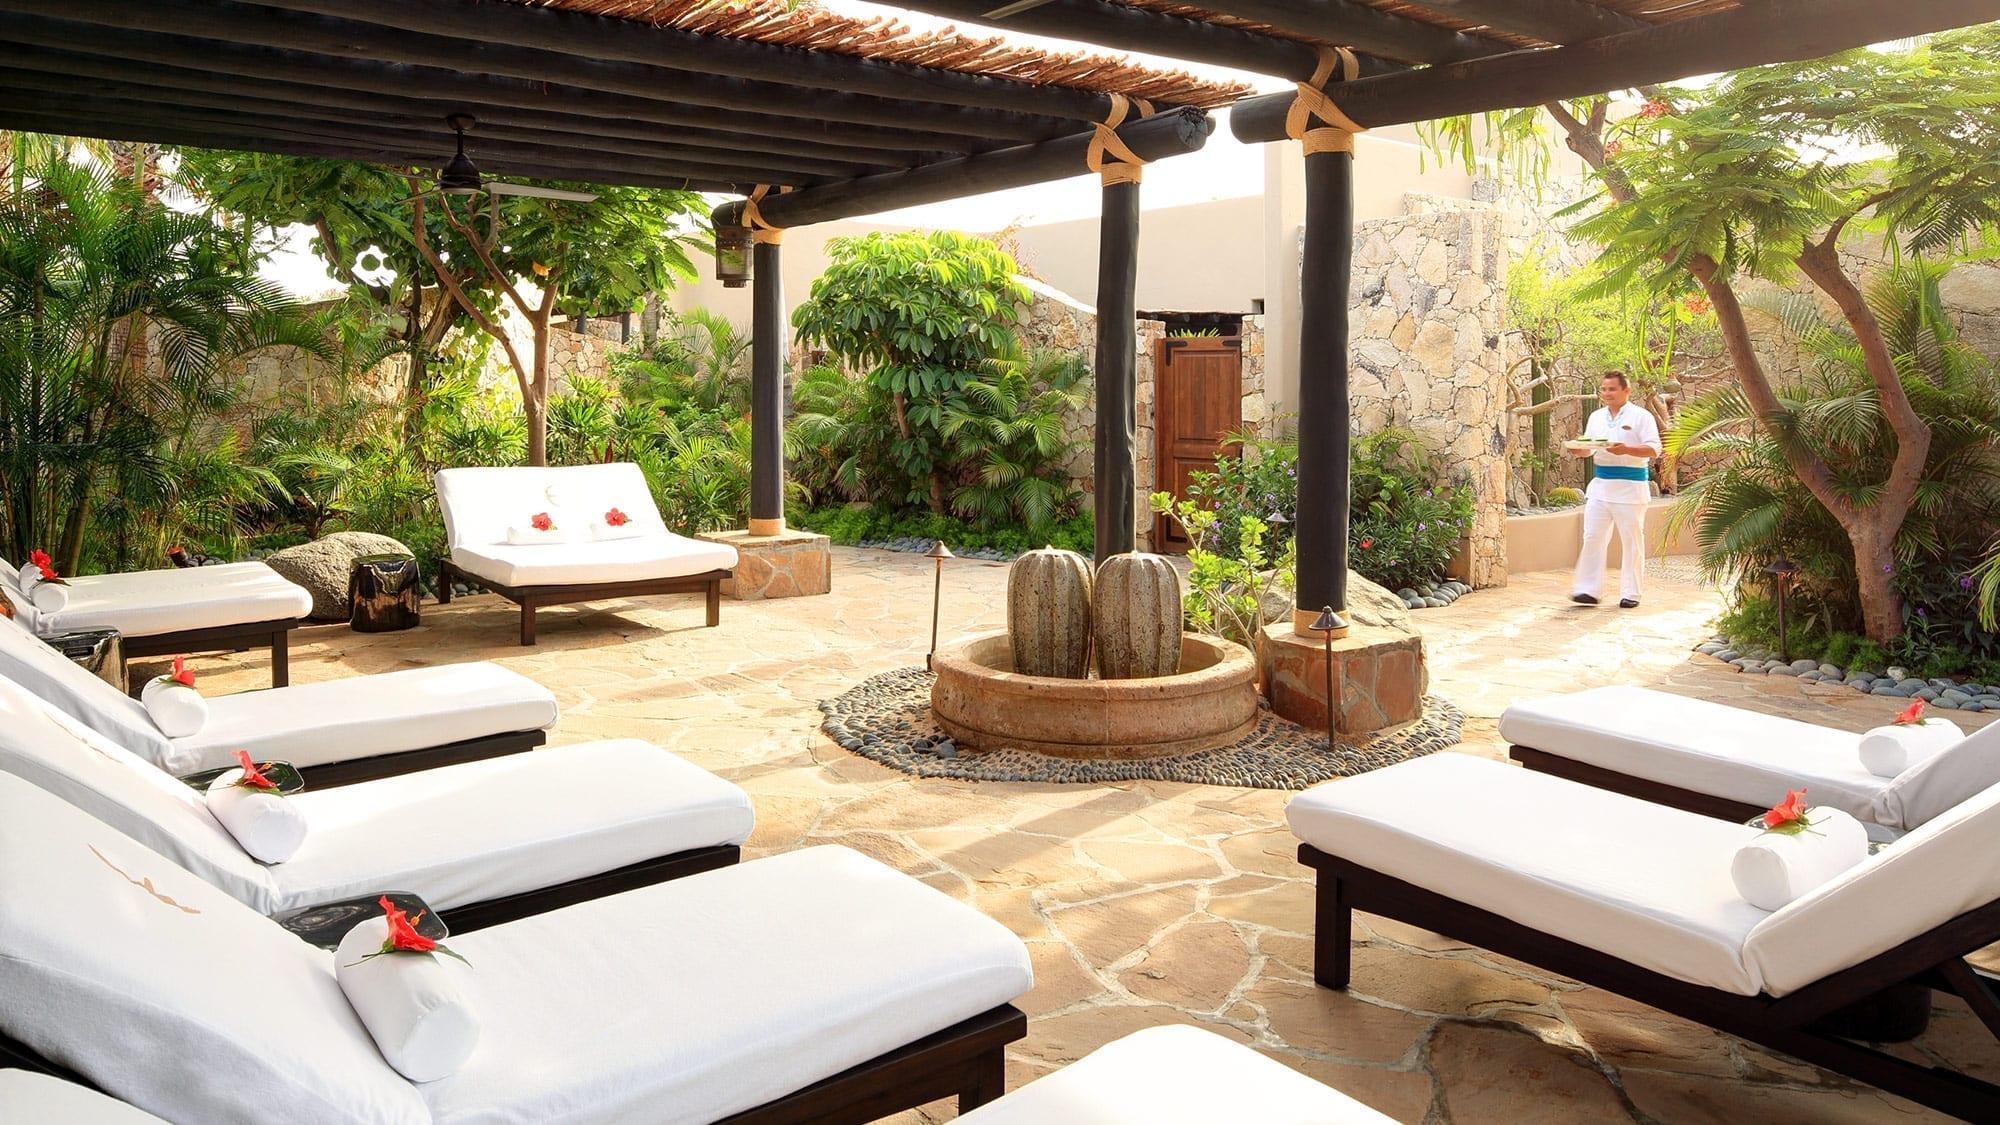 Hotel Esparanza Villa Lounge